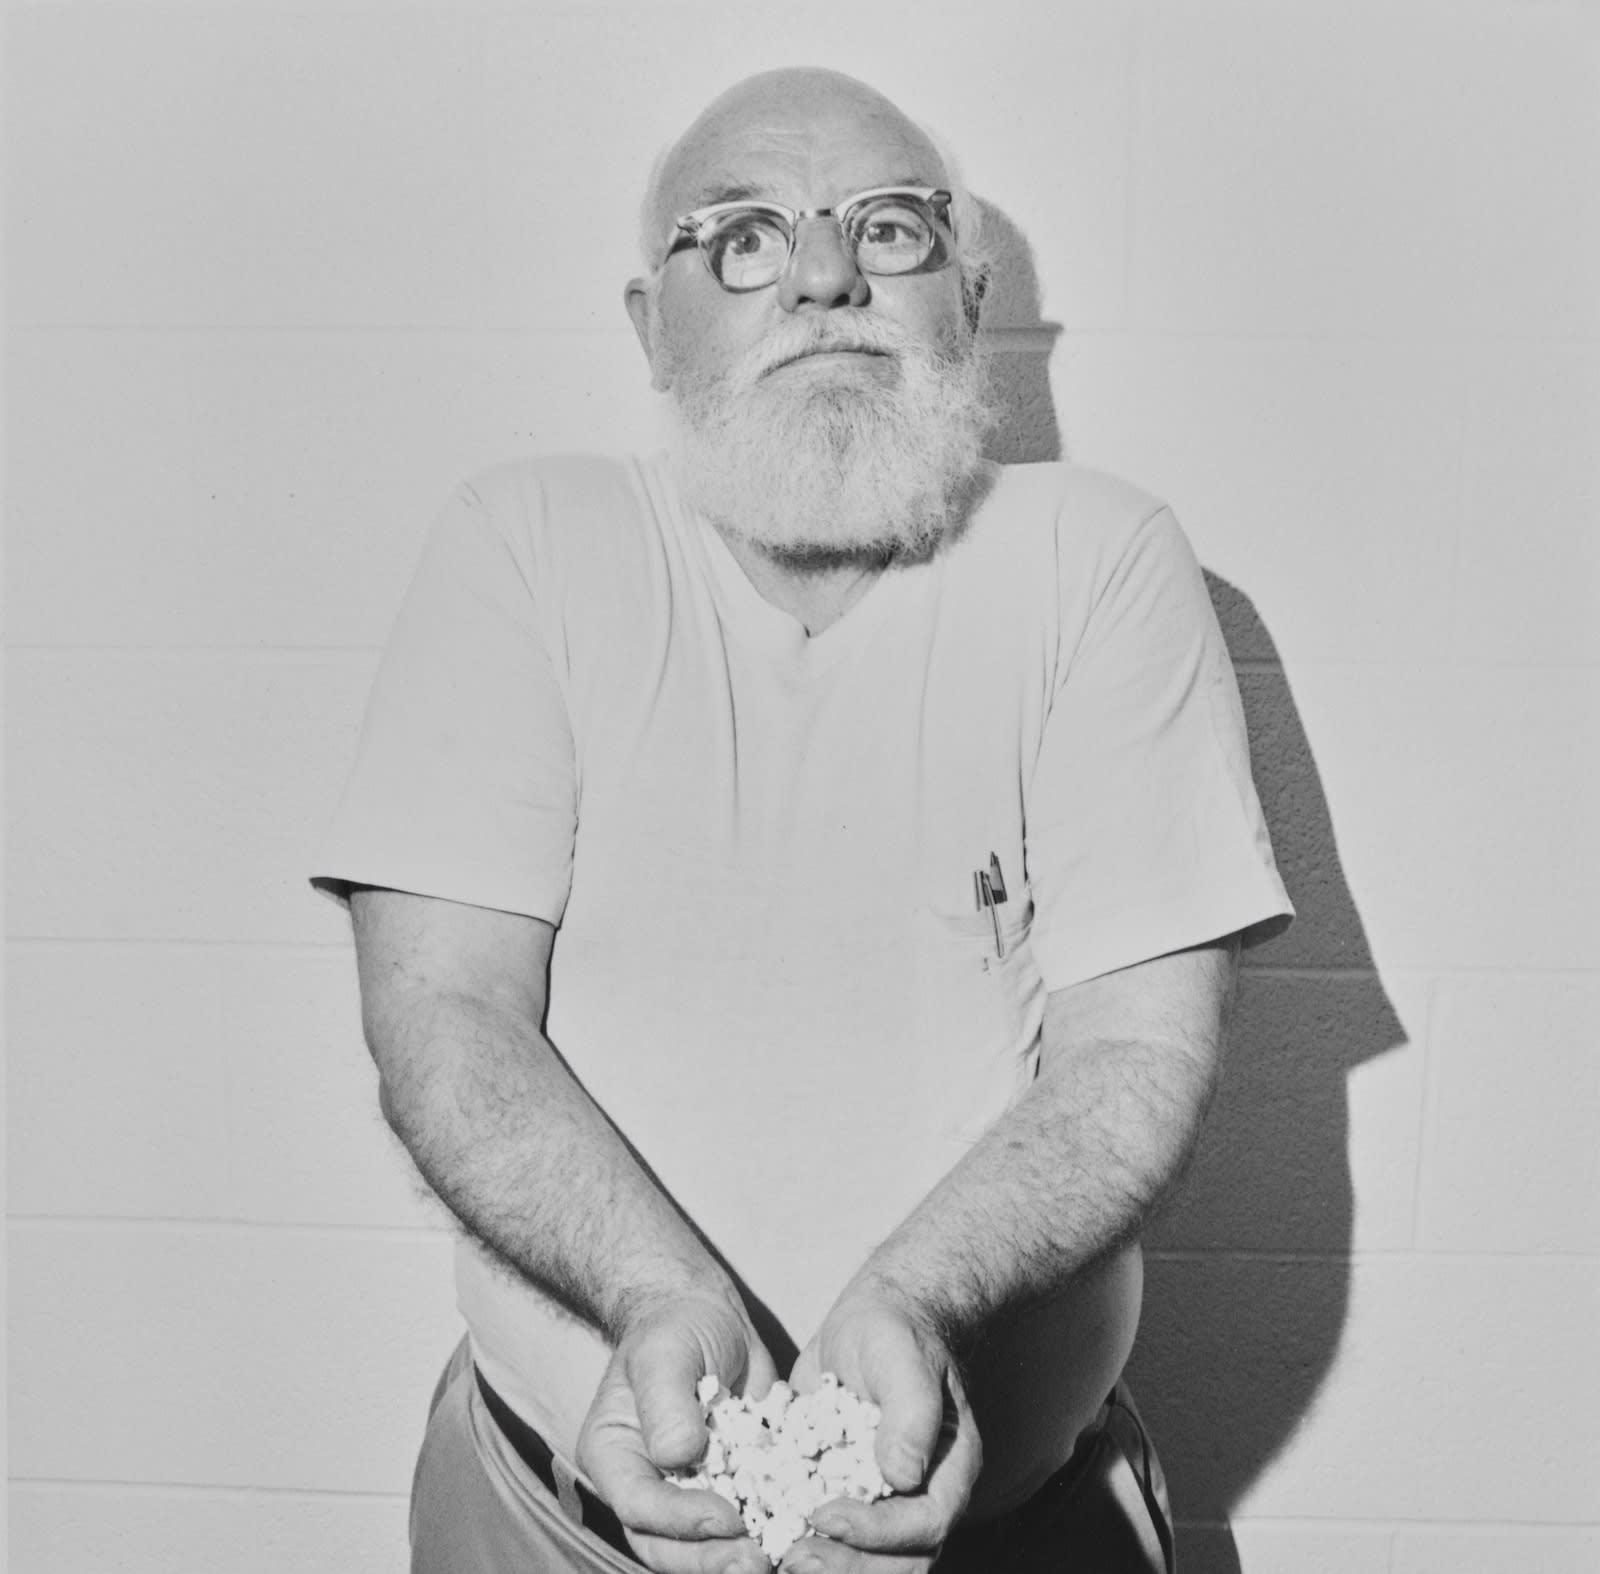 Steven Rifkin, Untitled, Henry Holmes Smith, 1977